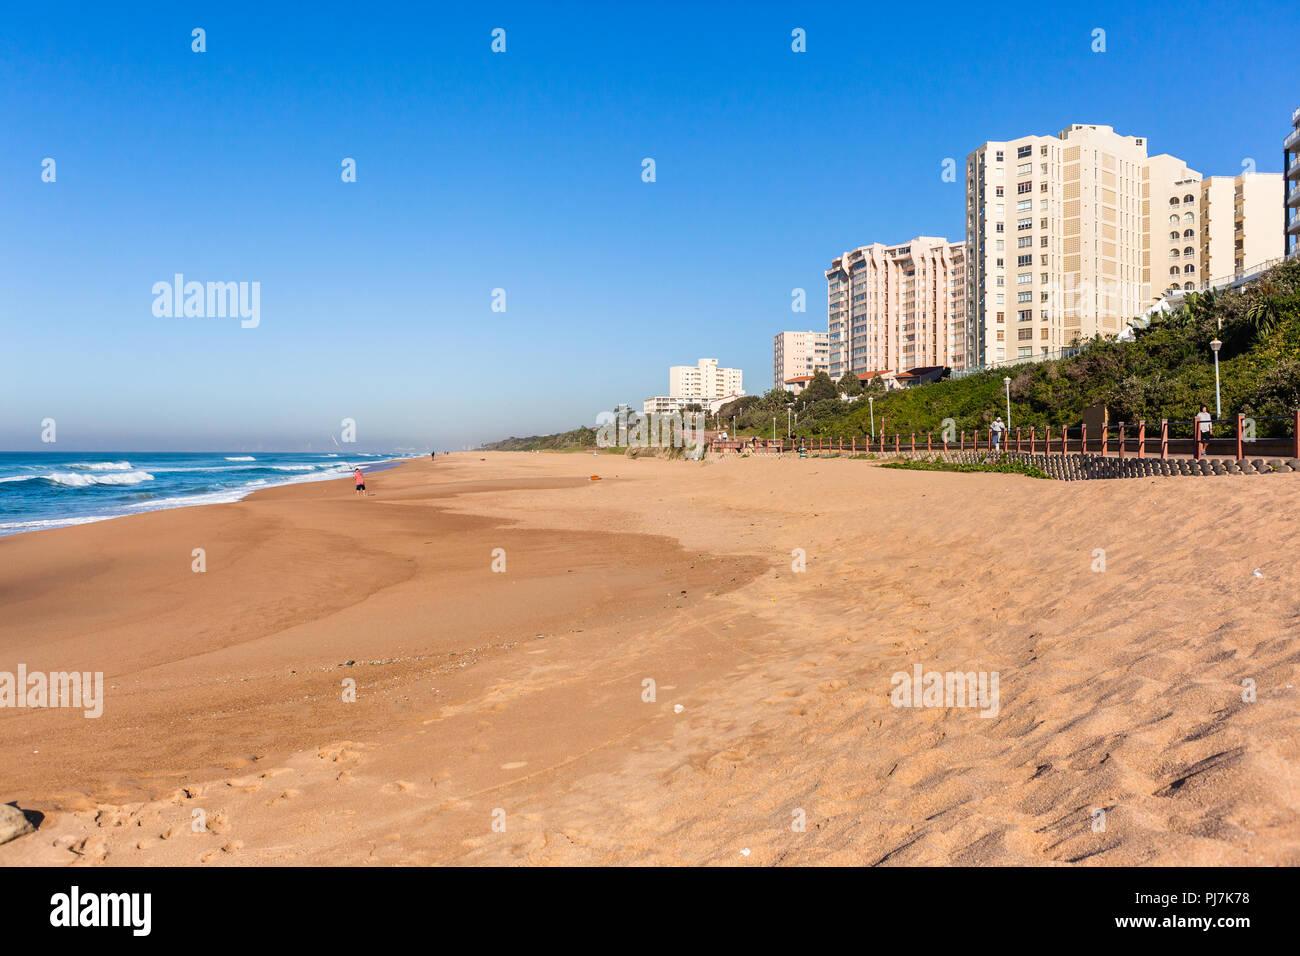 Beach ocean landscape with flat apartment buildings holiday lifestyle  coastline landscape. - Stock Image